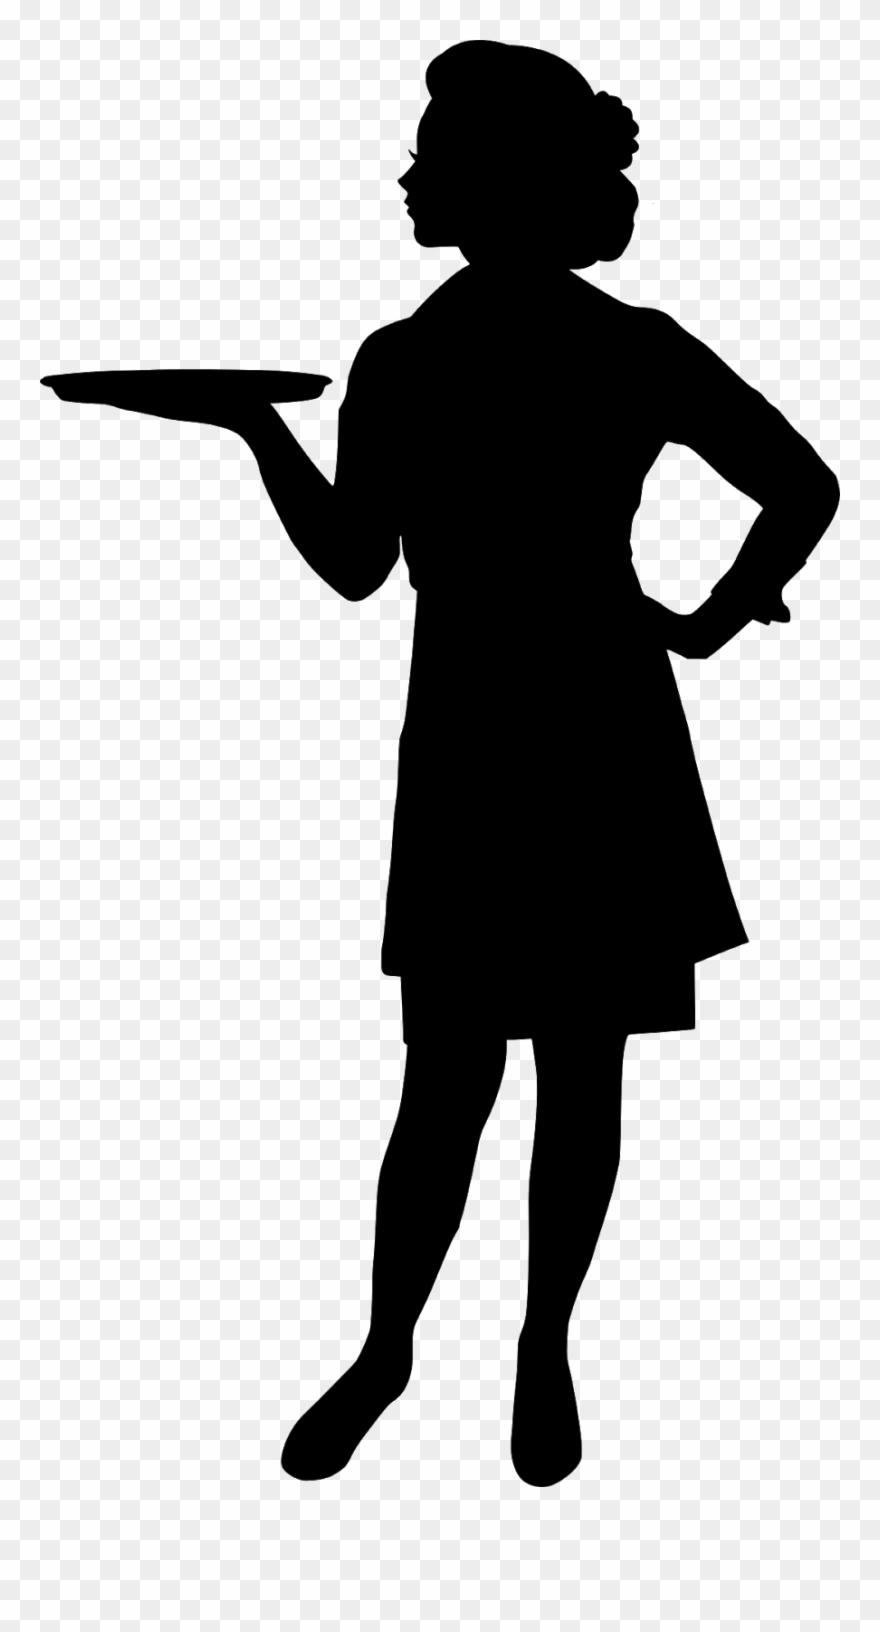 Waitress Silhouette Clipart (#4923661).